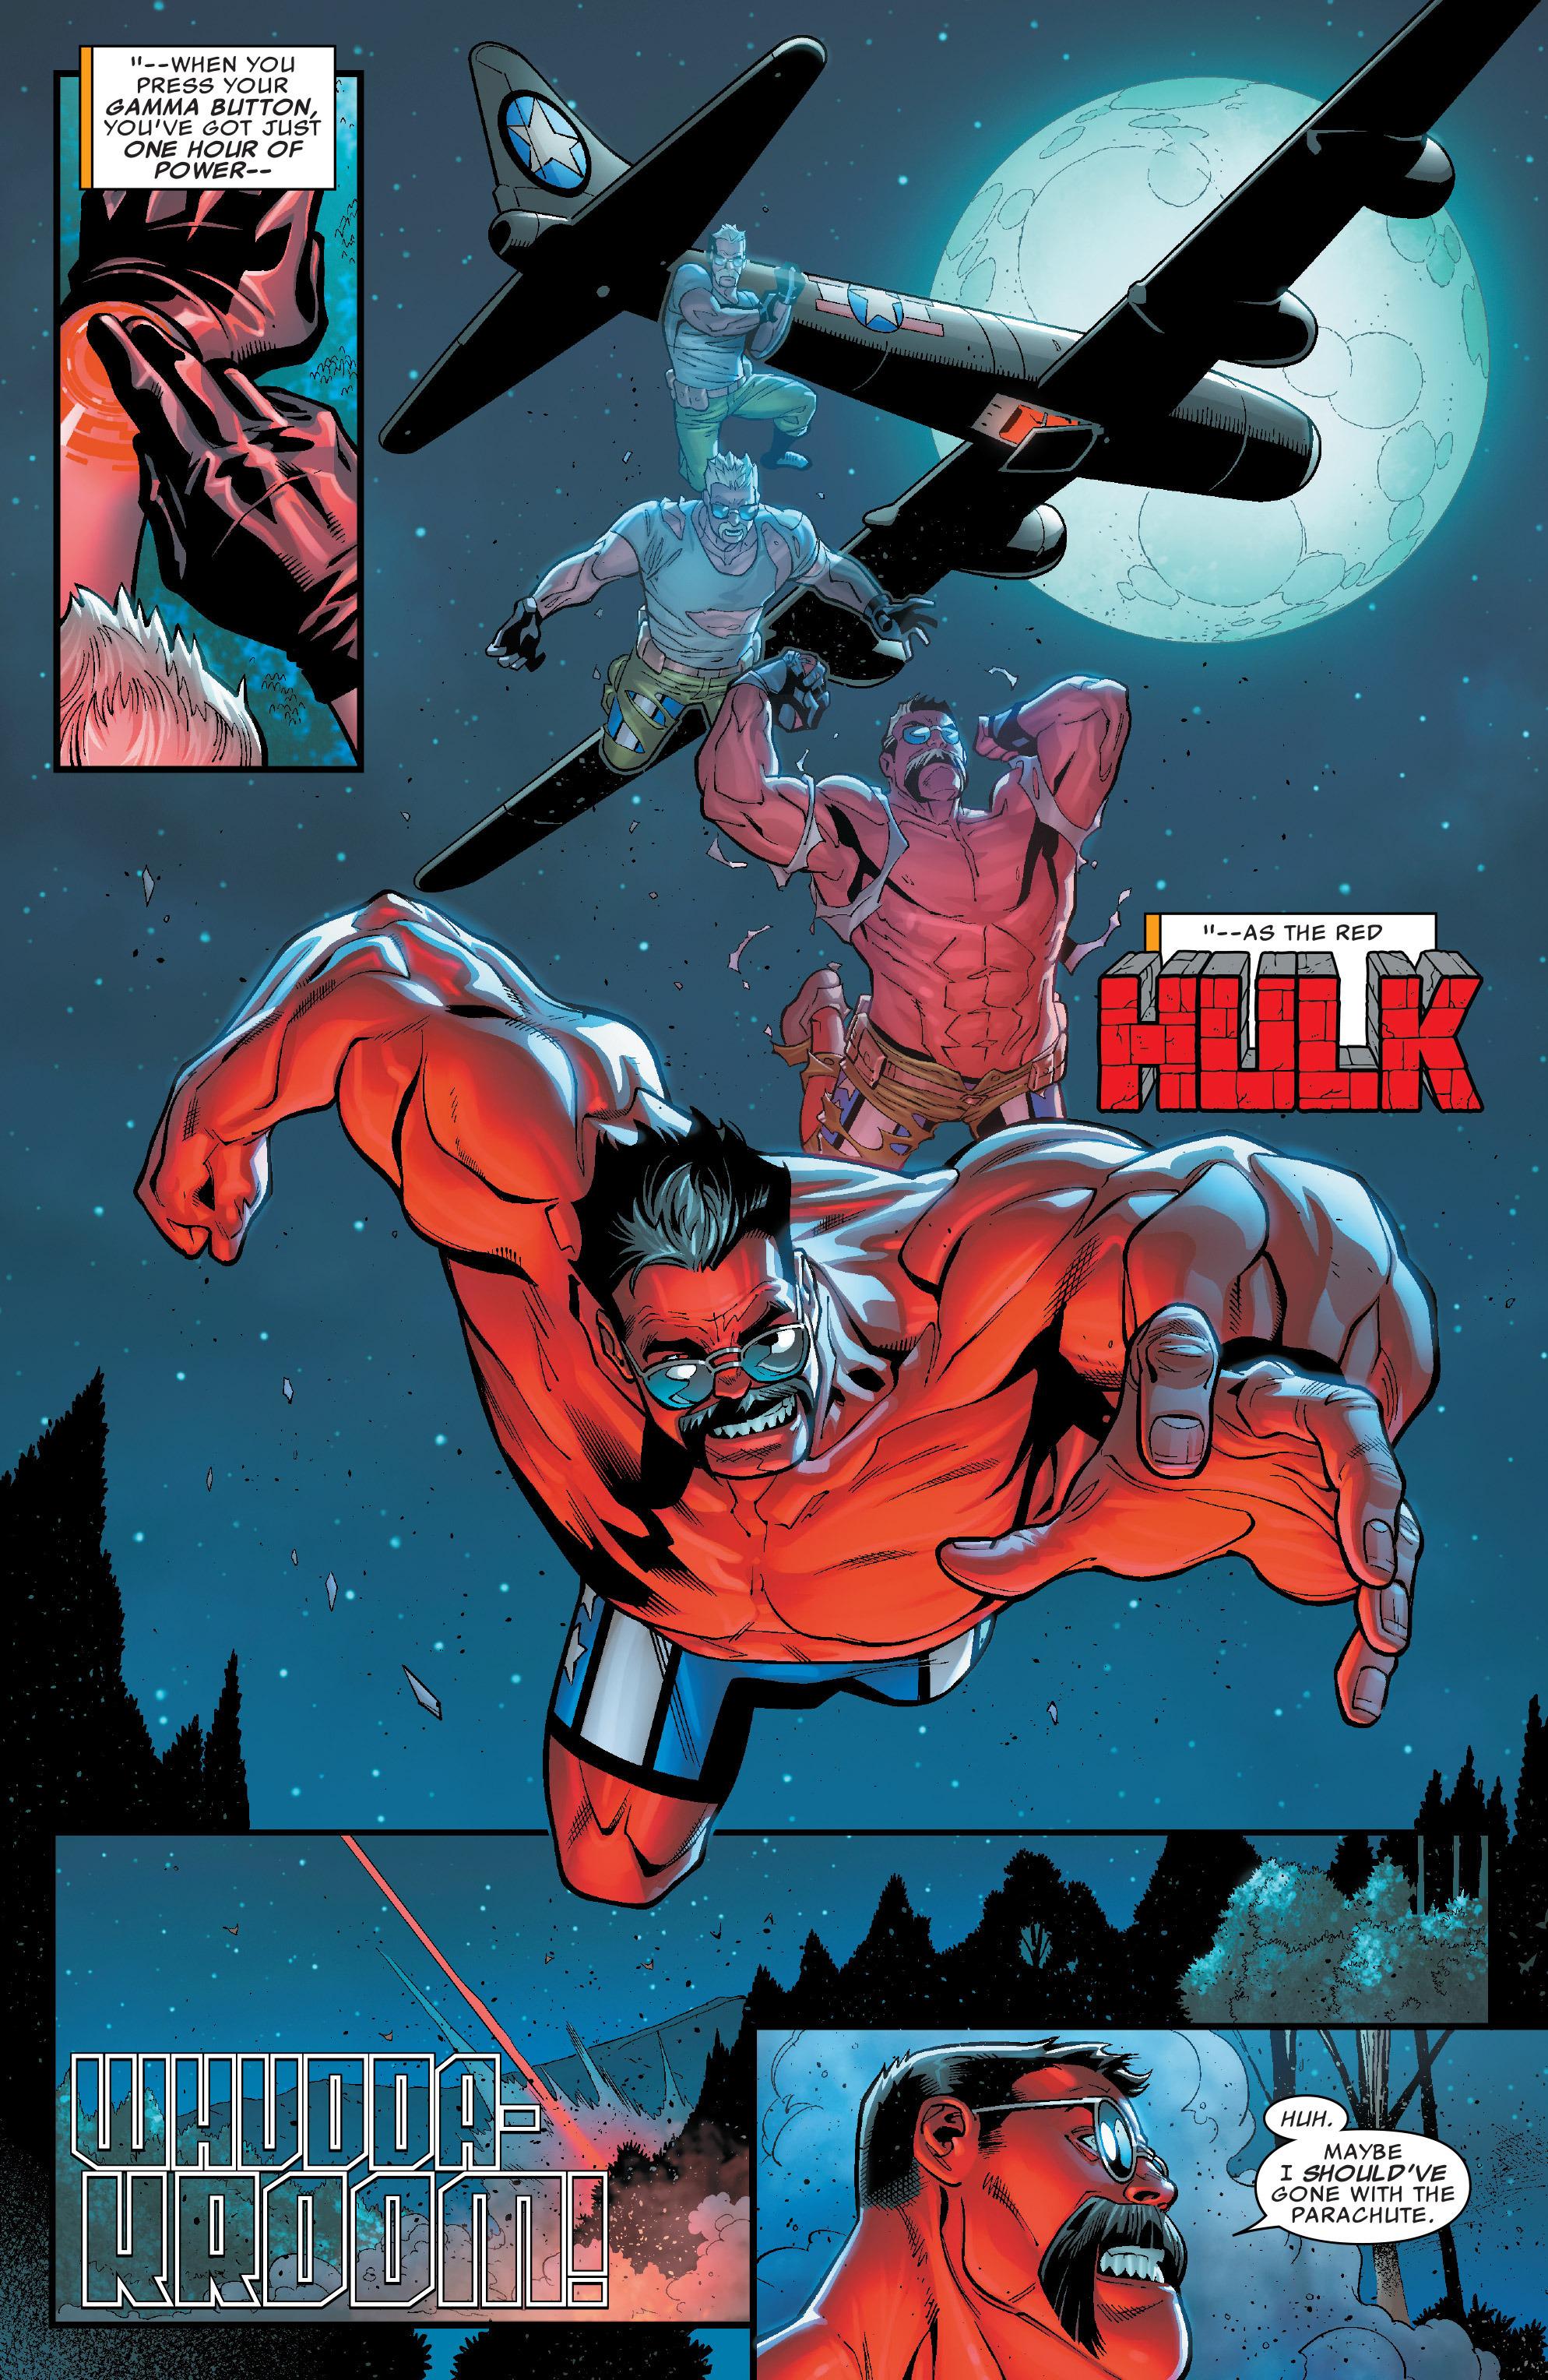 Read online U.S.Avengers comic -  Issue #4 - 6